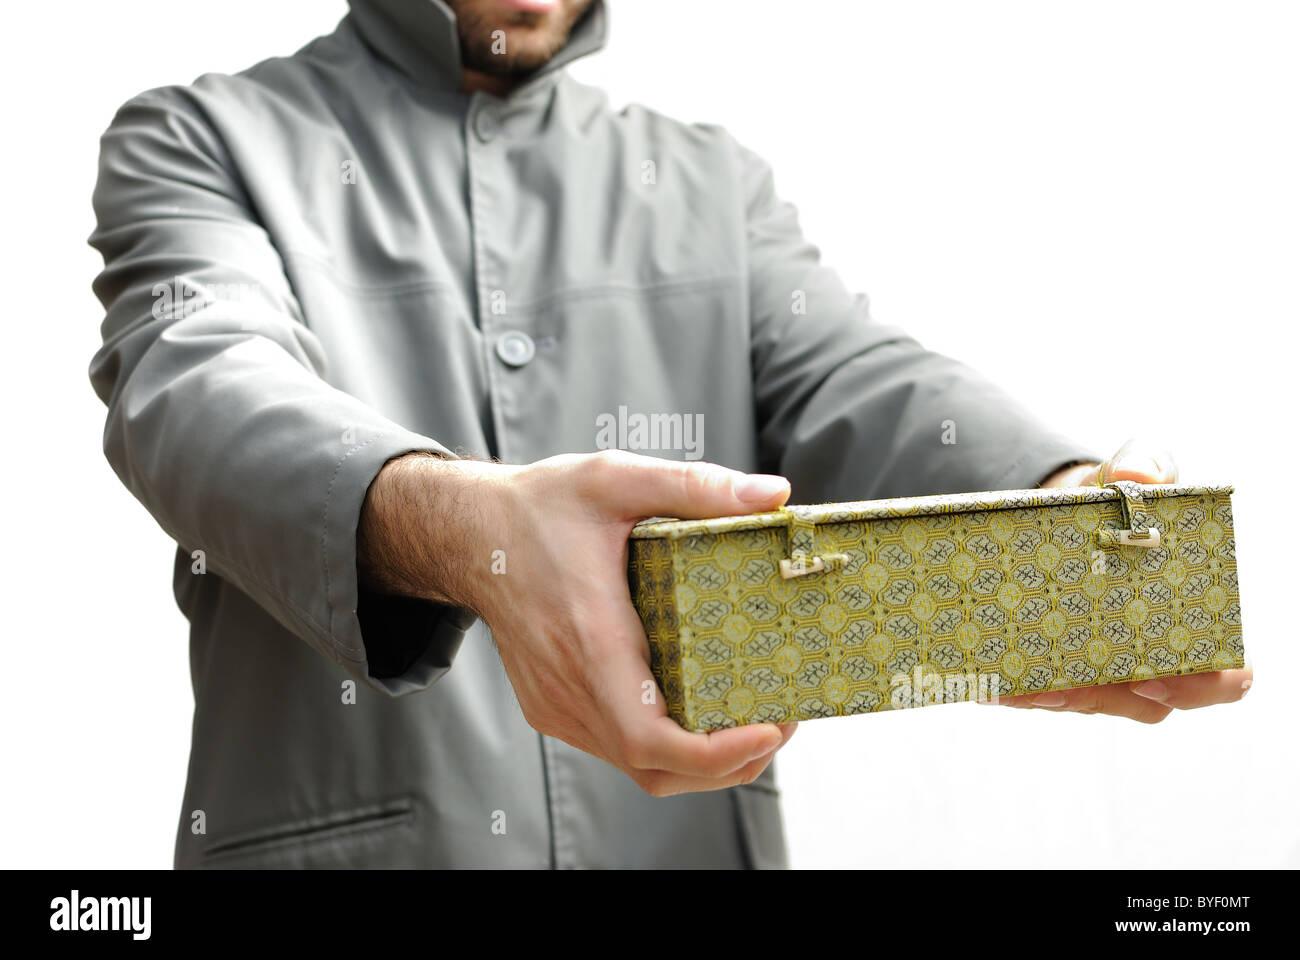 Mann im Regenmantel mit eine mysteriöse Kiste Stockbild